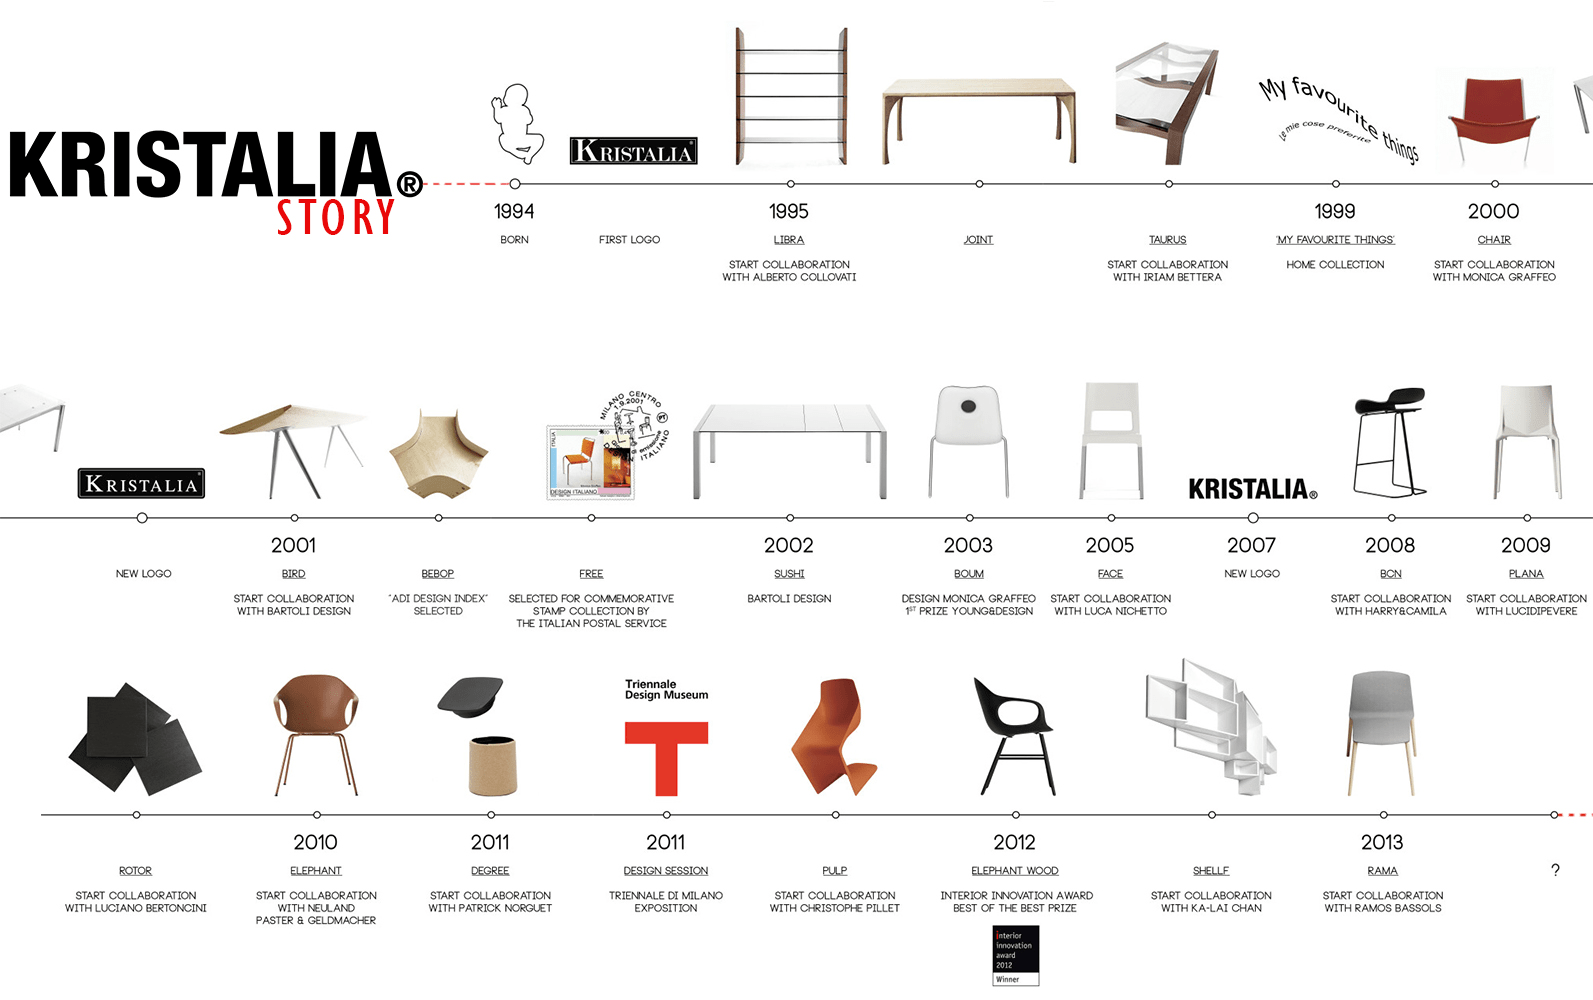 Kristalia Story